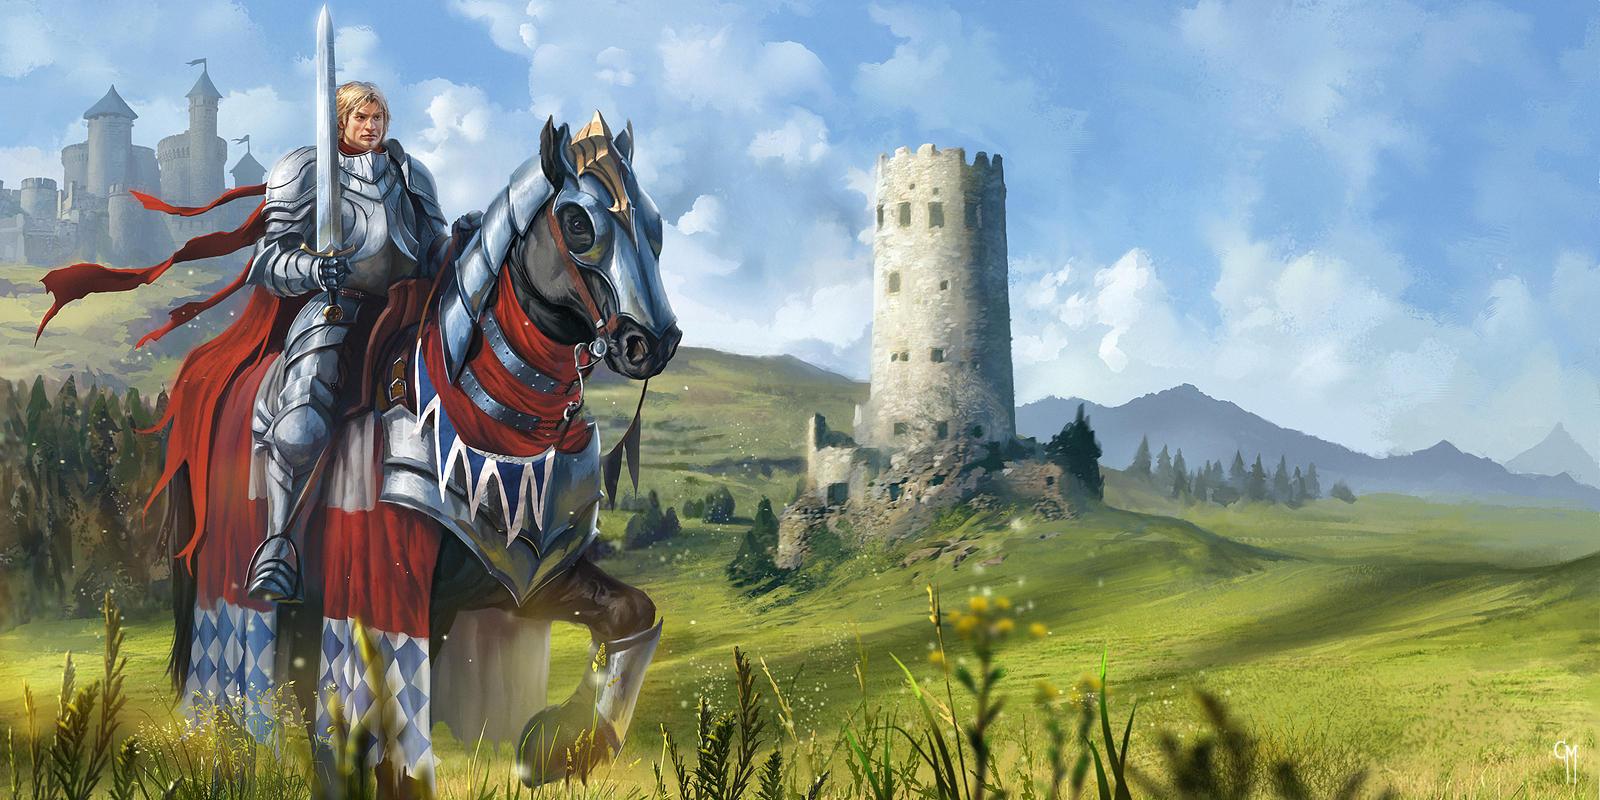 Medieval Fair - The Good Knight by caiomm on DeviantArt